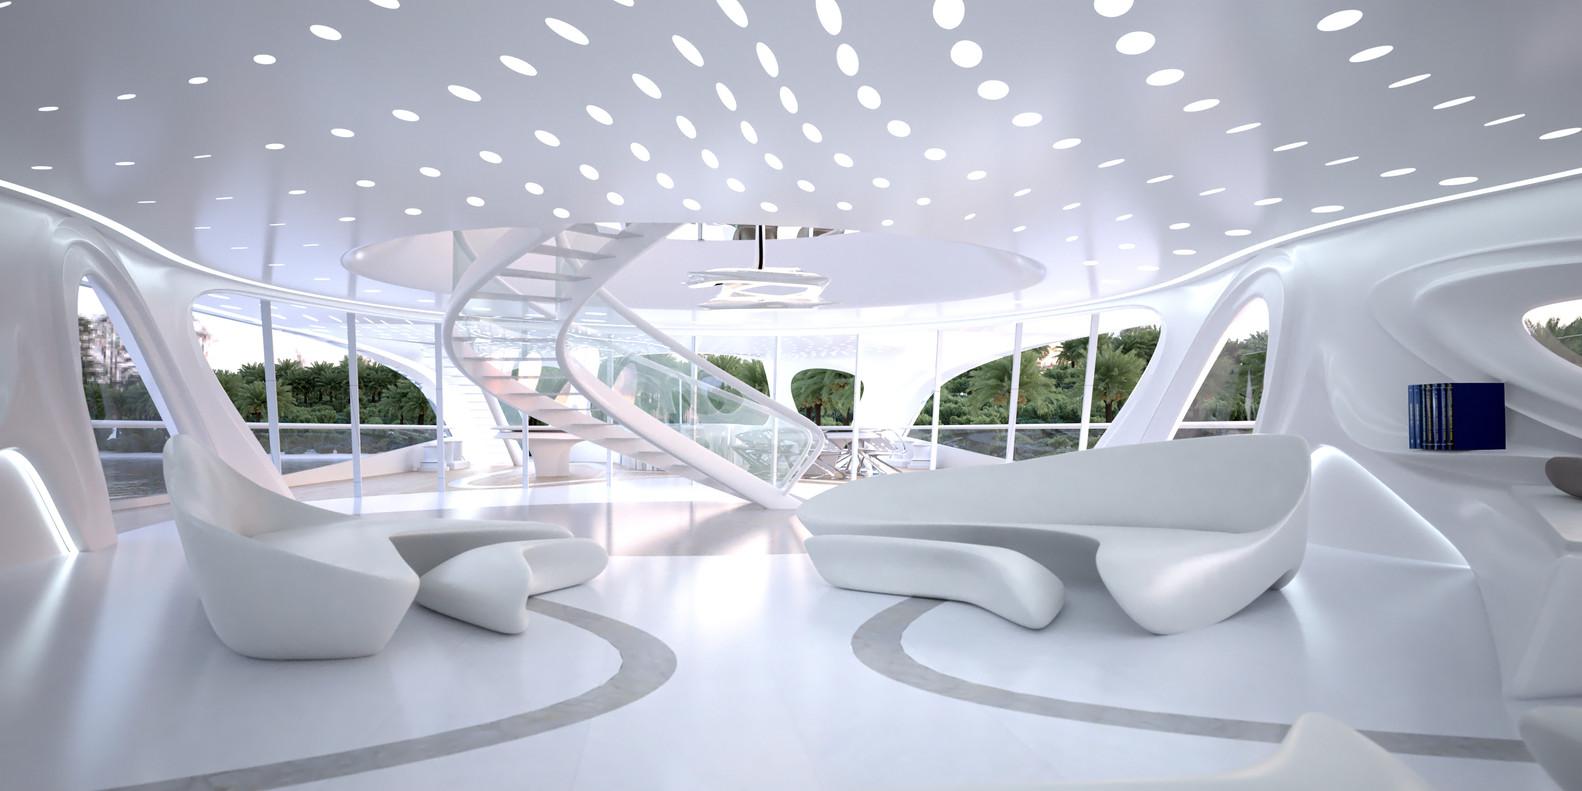 Delightful Zaha Hadid Designs Superyacht,© Unique Circle Yachts / Zaha Hadid  Architects For Bloom+